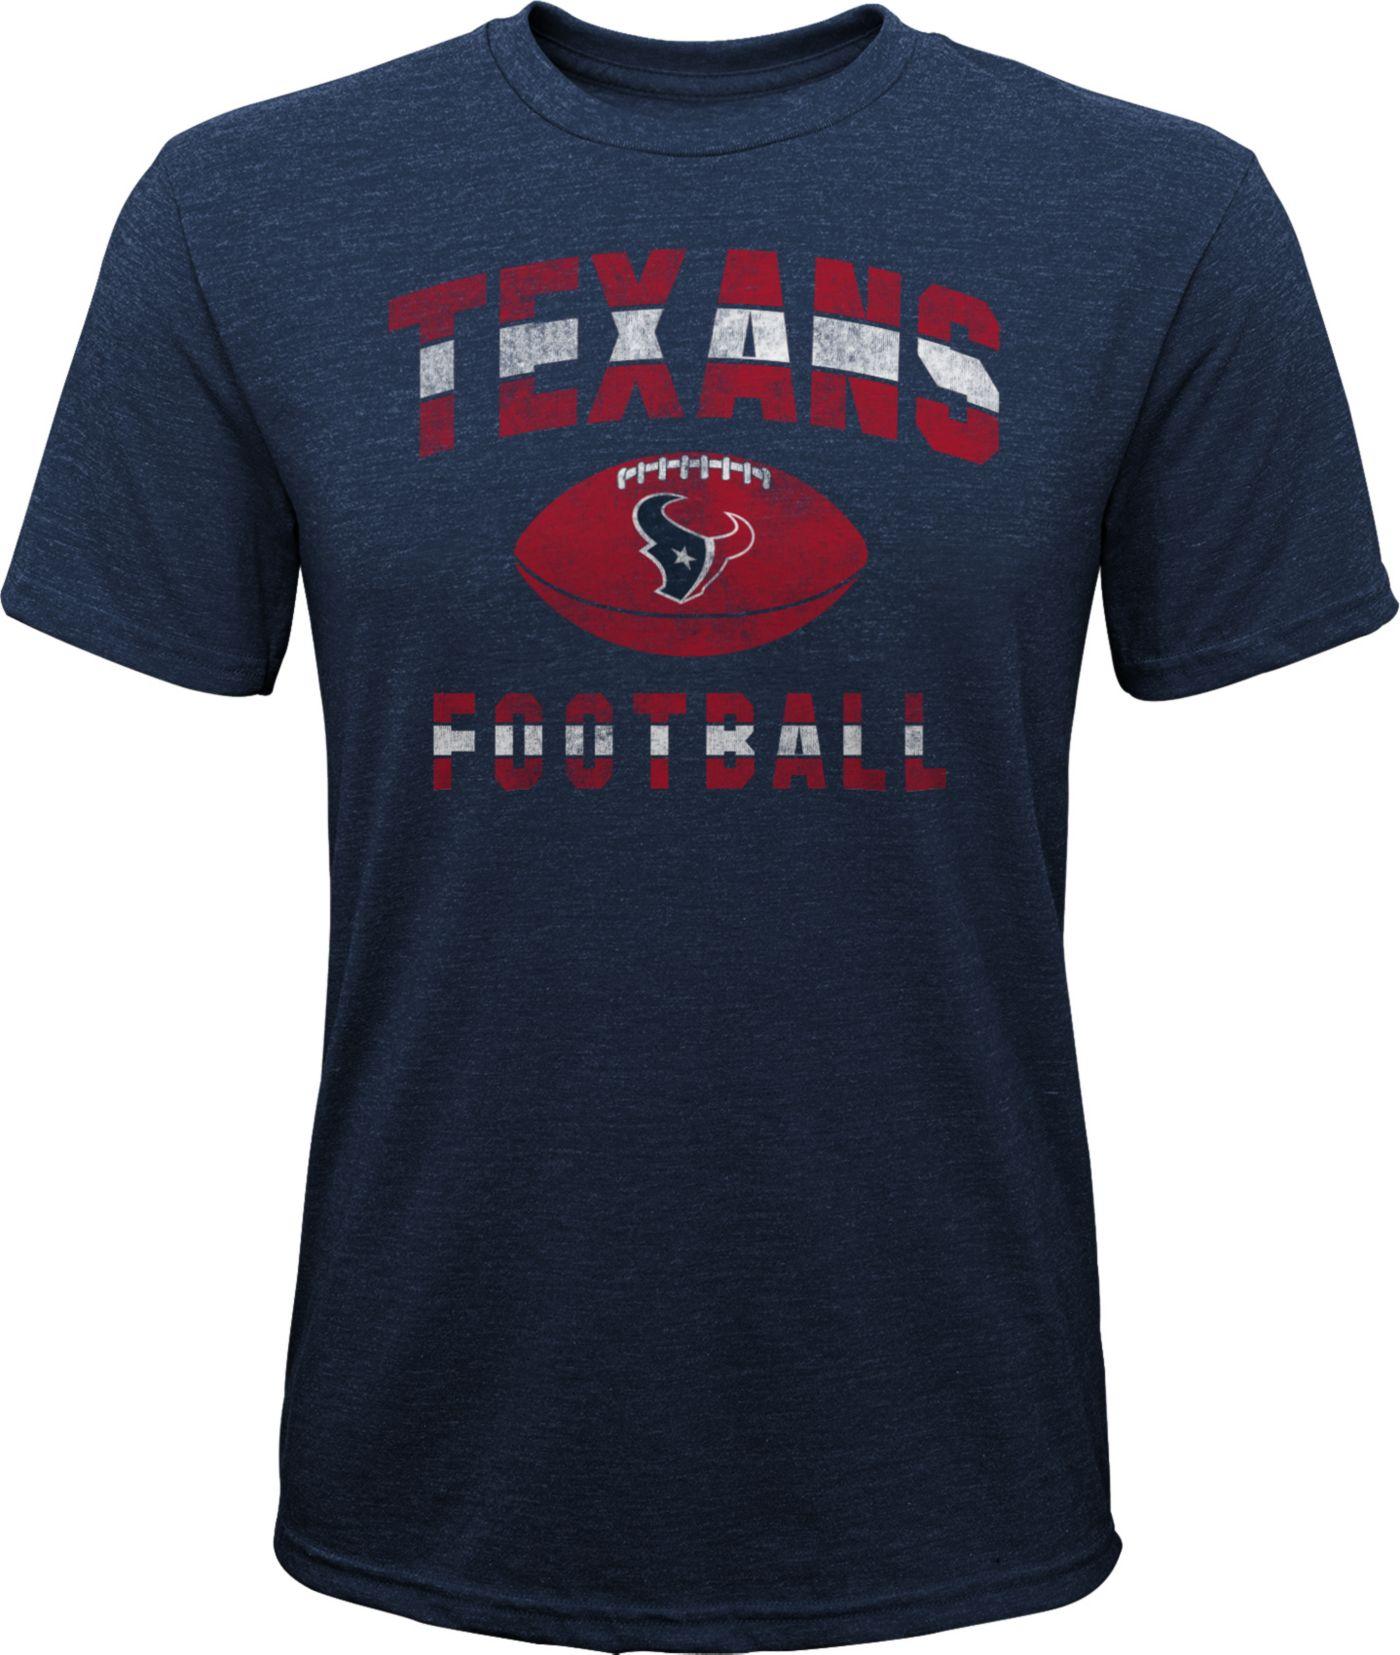 NFL Team Apparel Youth Houston Texans Big Game Tri-Blend Navy T-Shirt